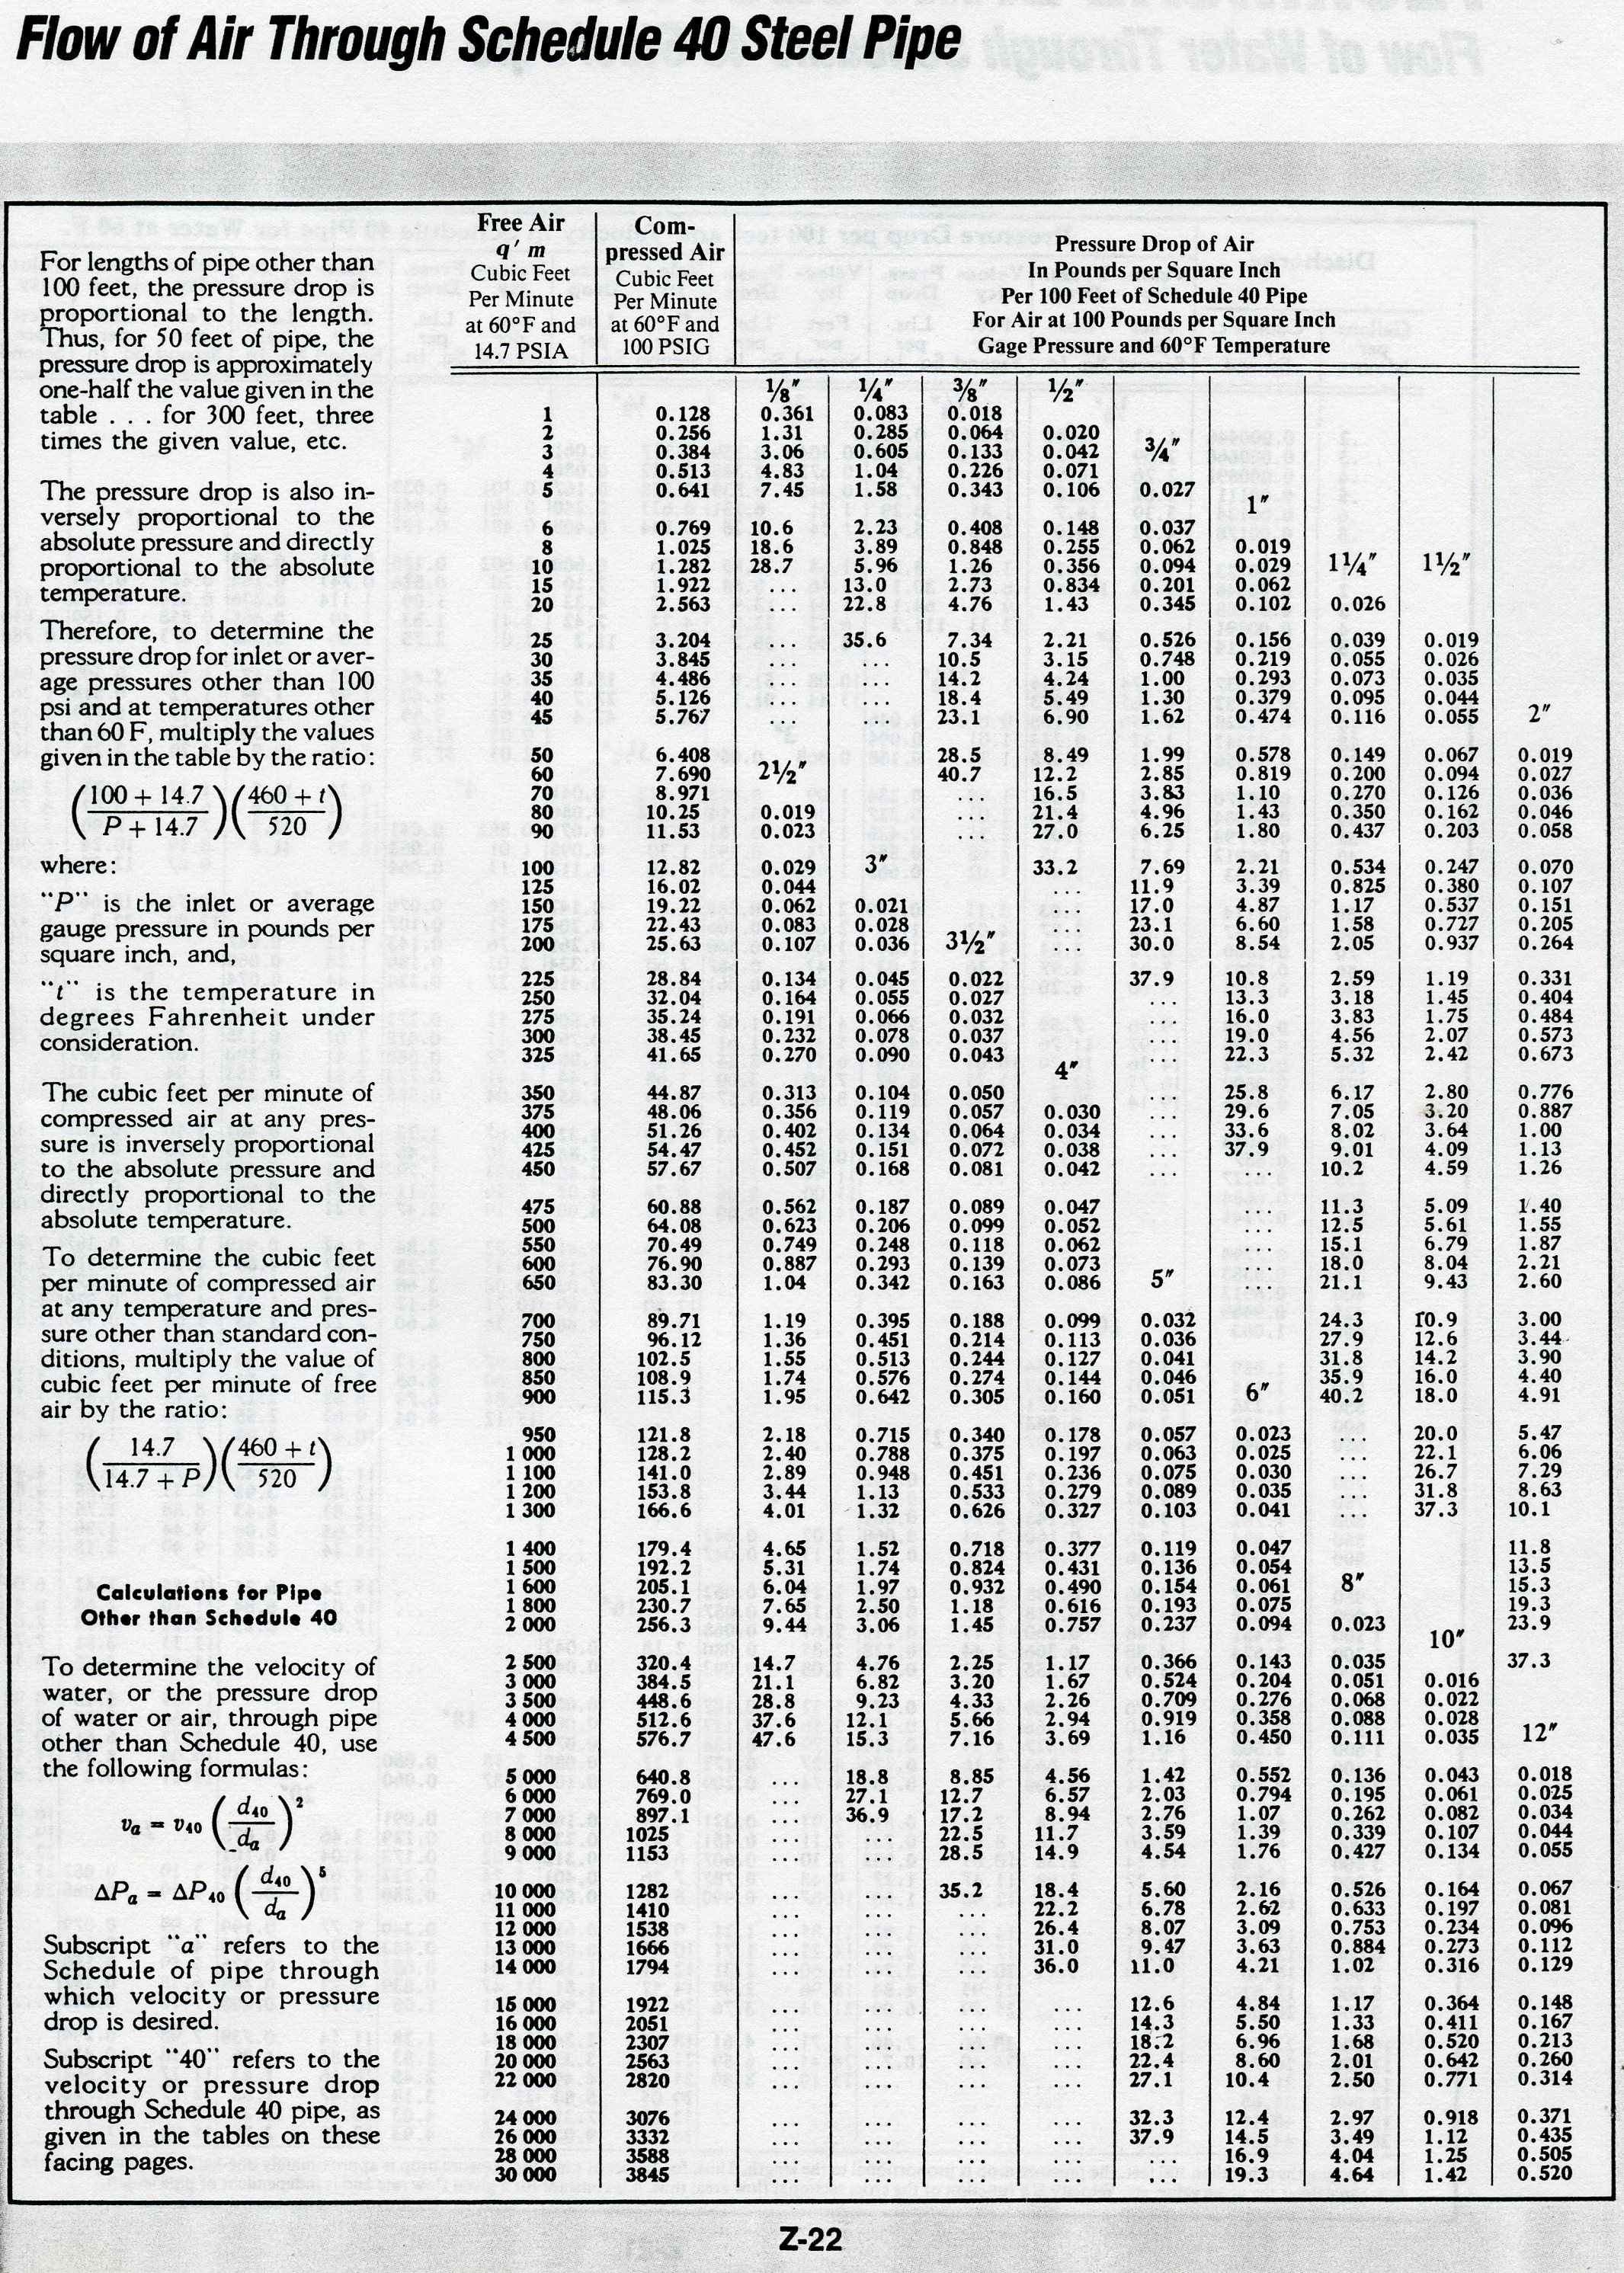 Flow Of Air Through Schedule 40 Steel Pipe